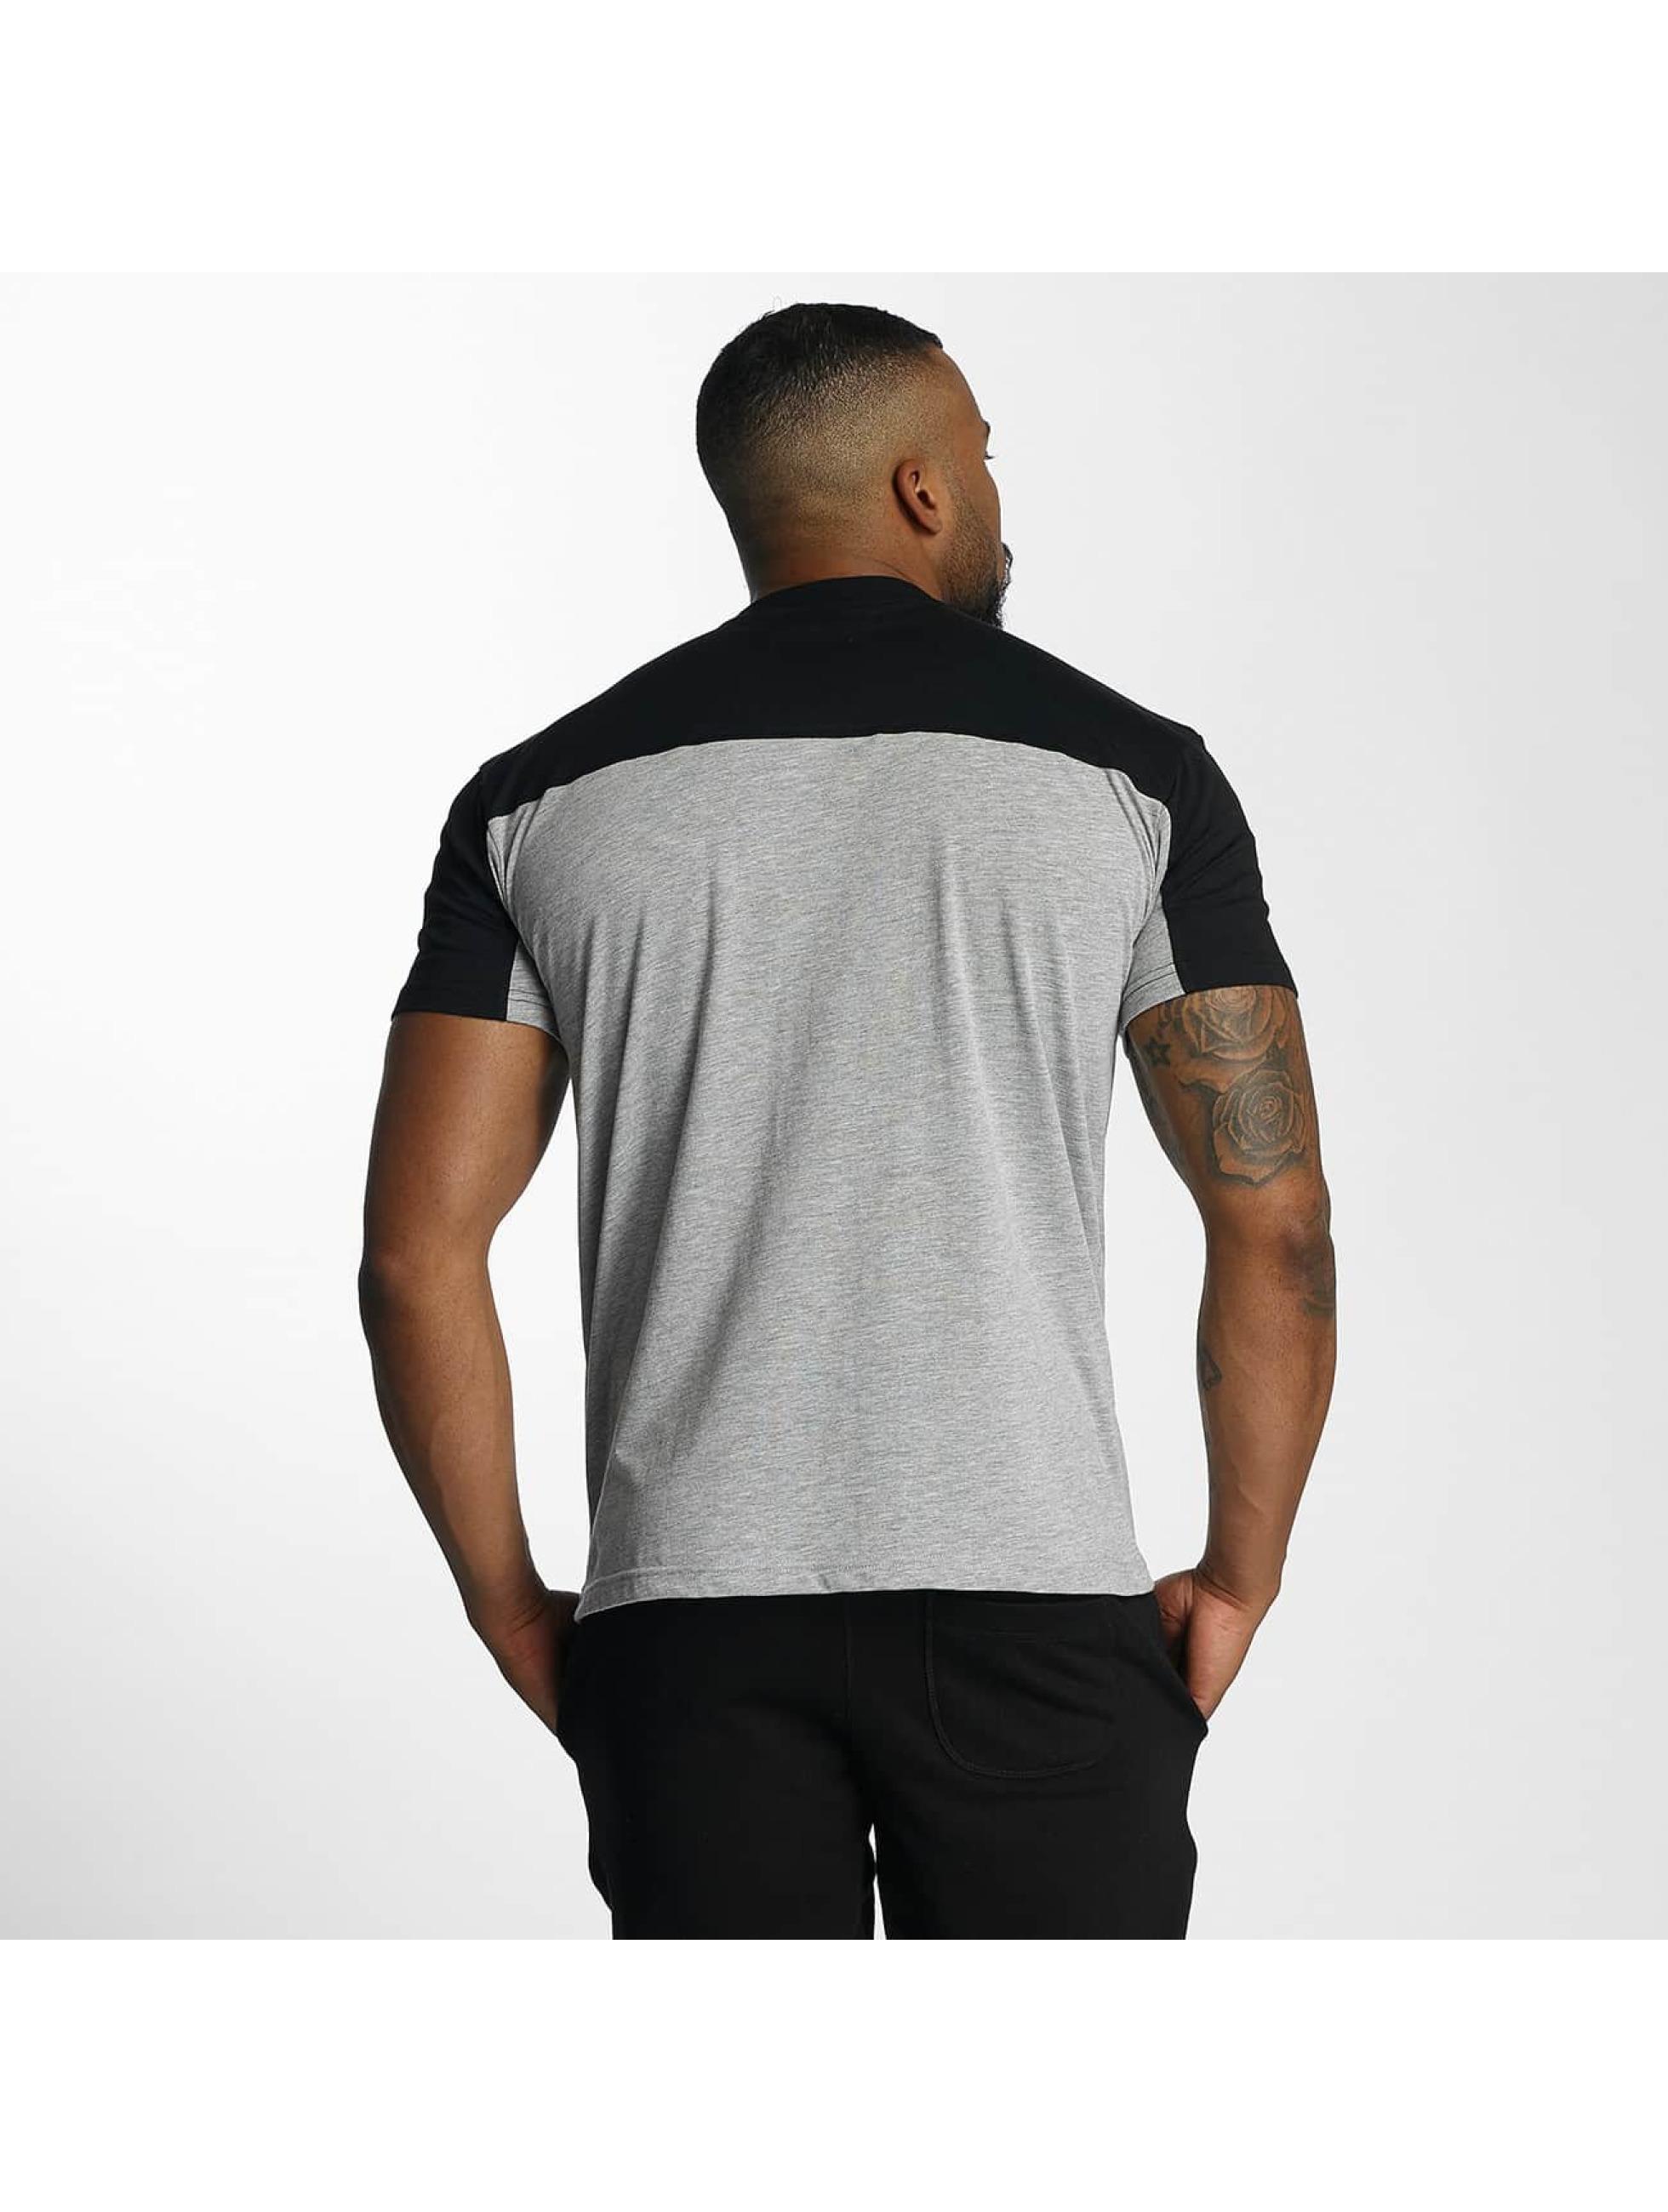 Pusher Apparel t-shirt 137 Riot grijs